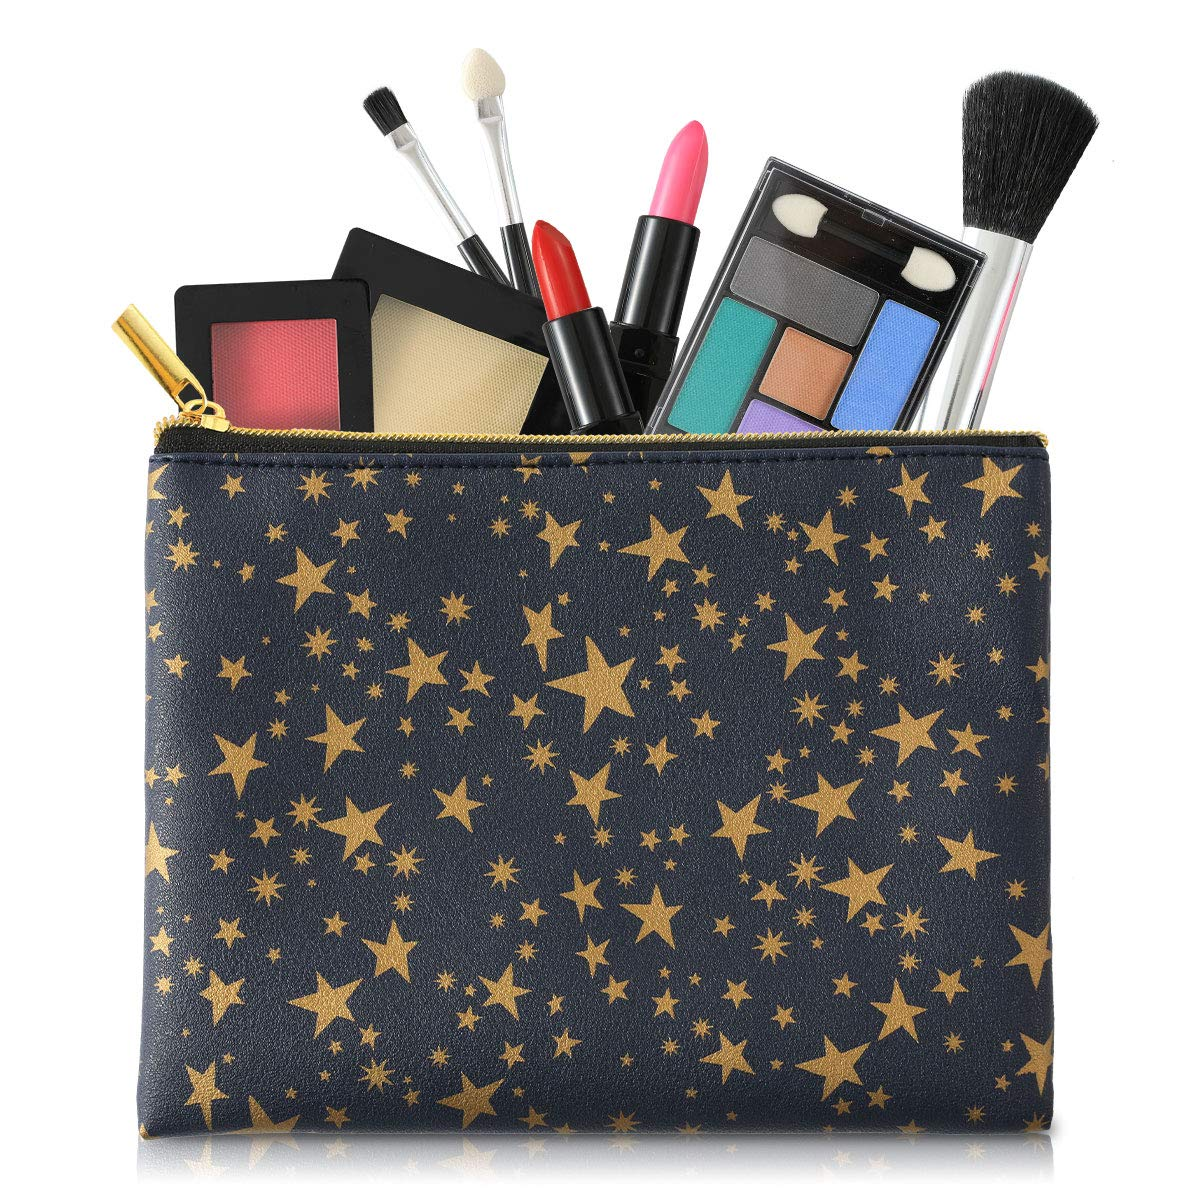 TOKIA Kids Makeup Kit for Little Girl, Washable Girls Makeup Kit with Portable Bag by TOKIA